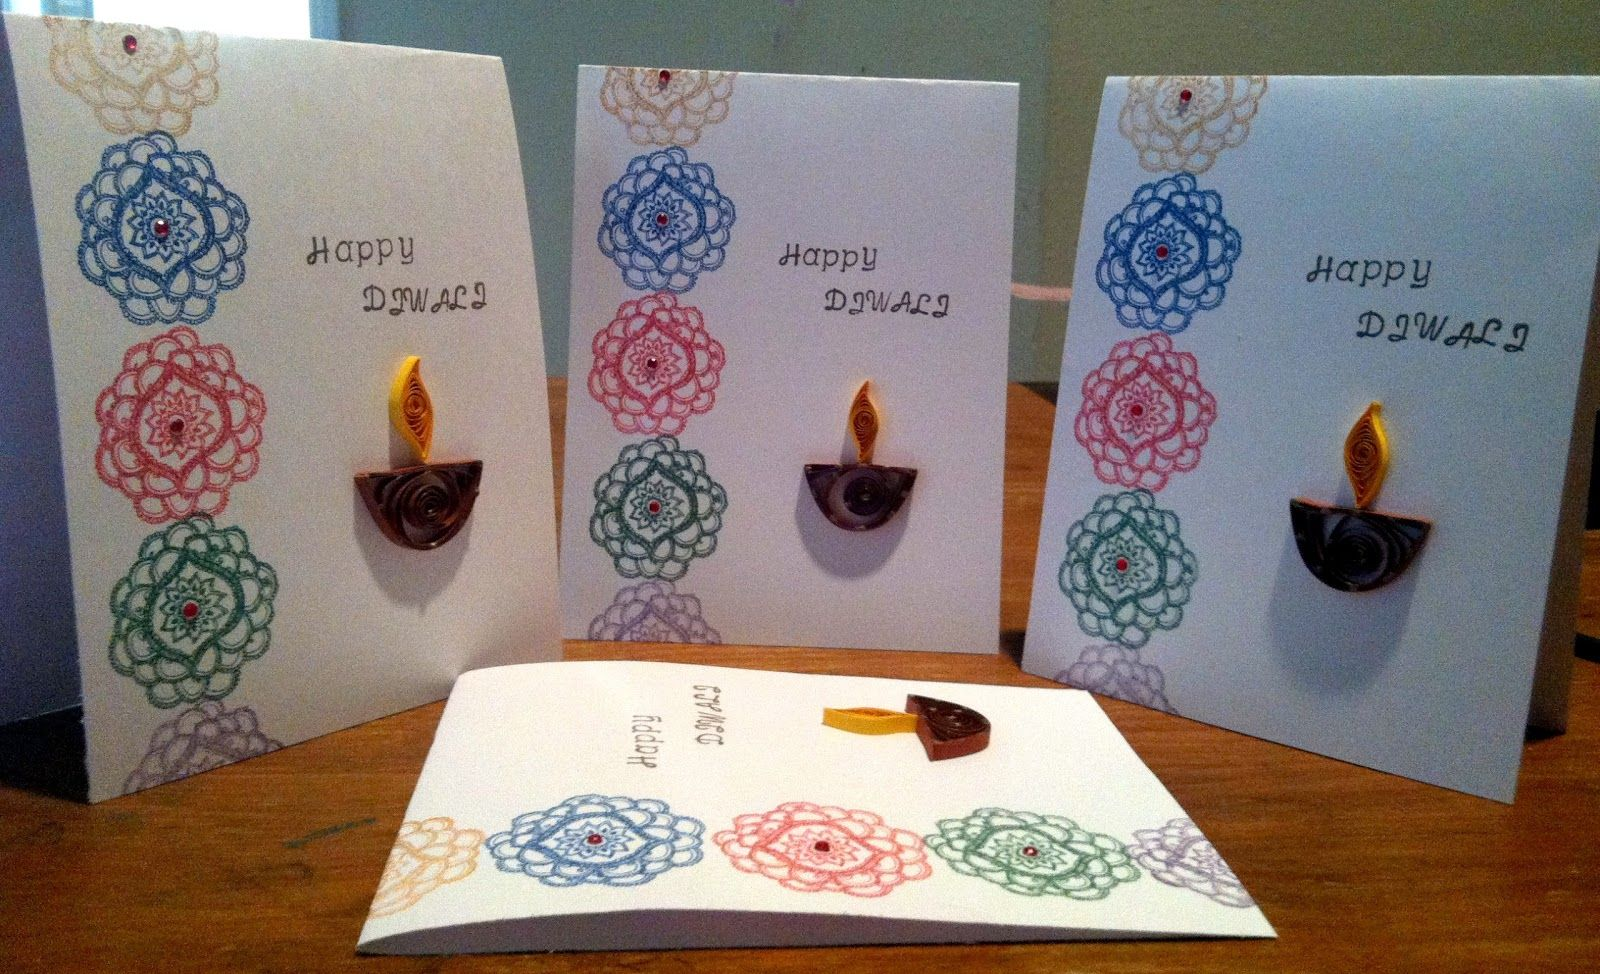 My kraft korner happy diwali card making ideas pinterest simple diwali card making ideas to celebrate diwali craft kristyandbryce Gallery